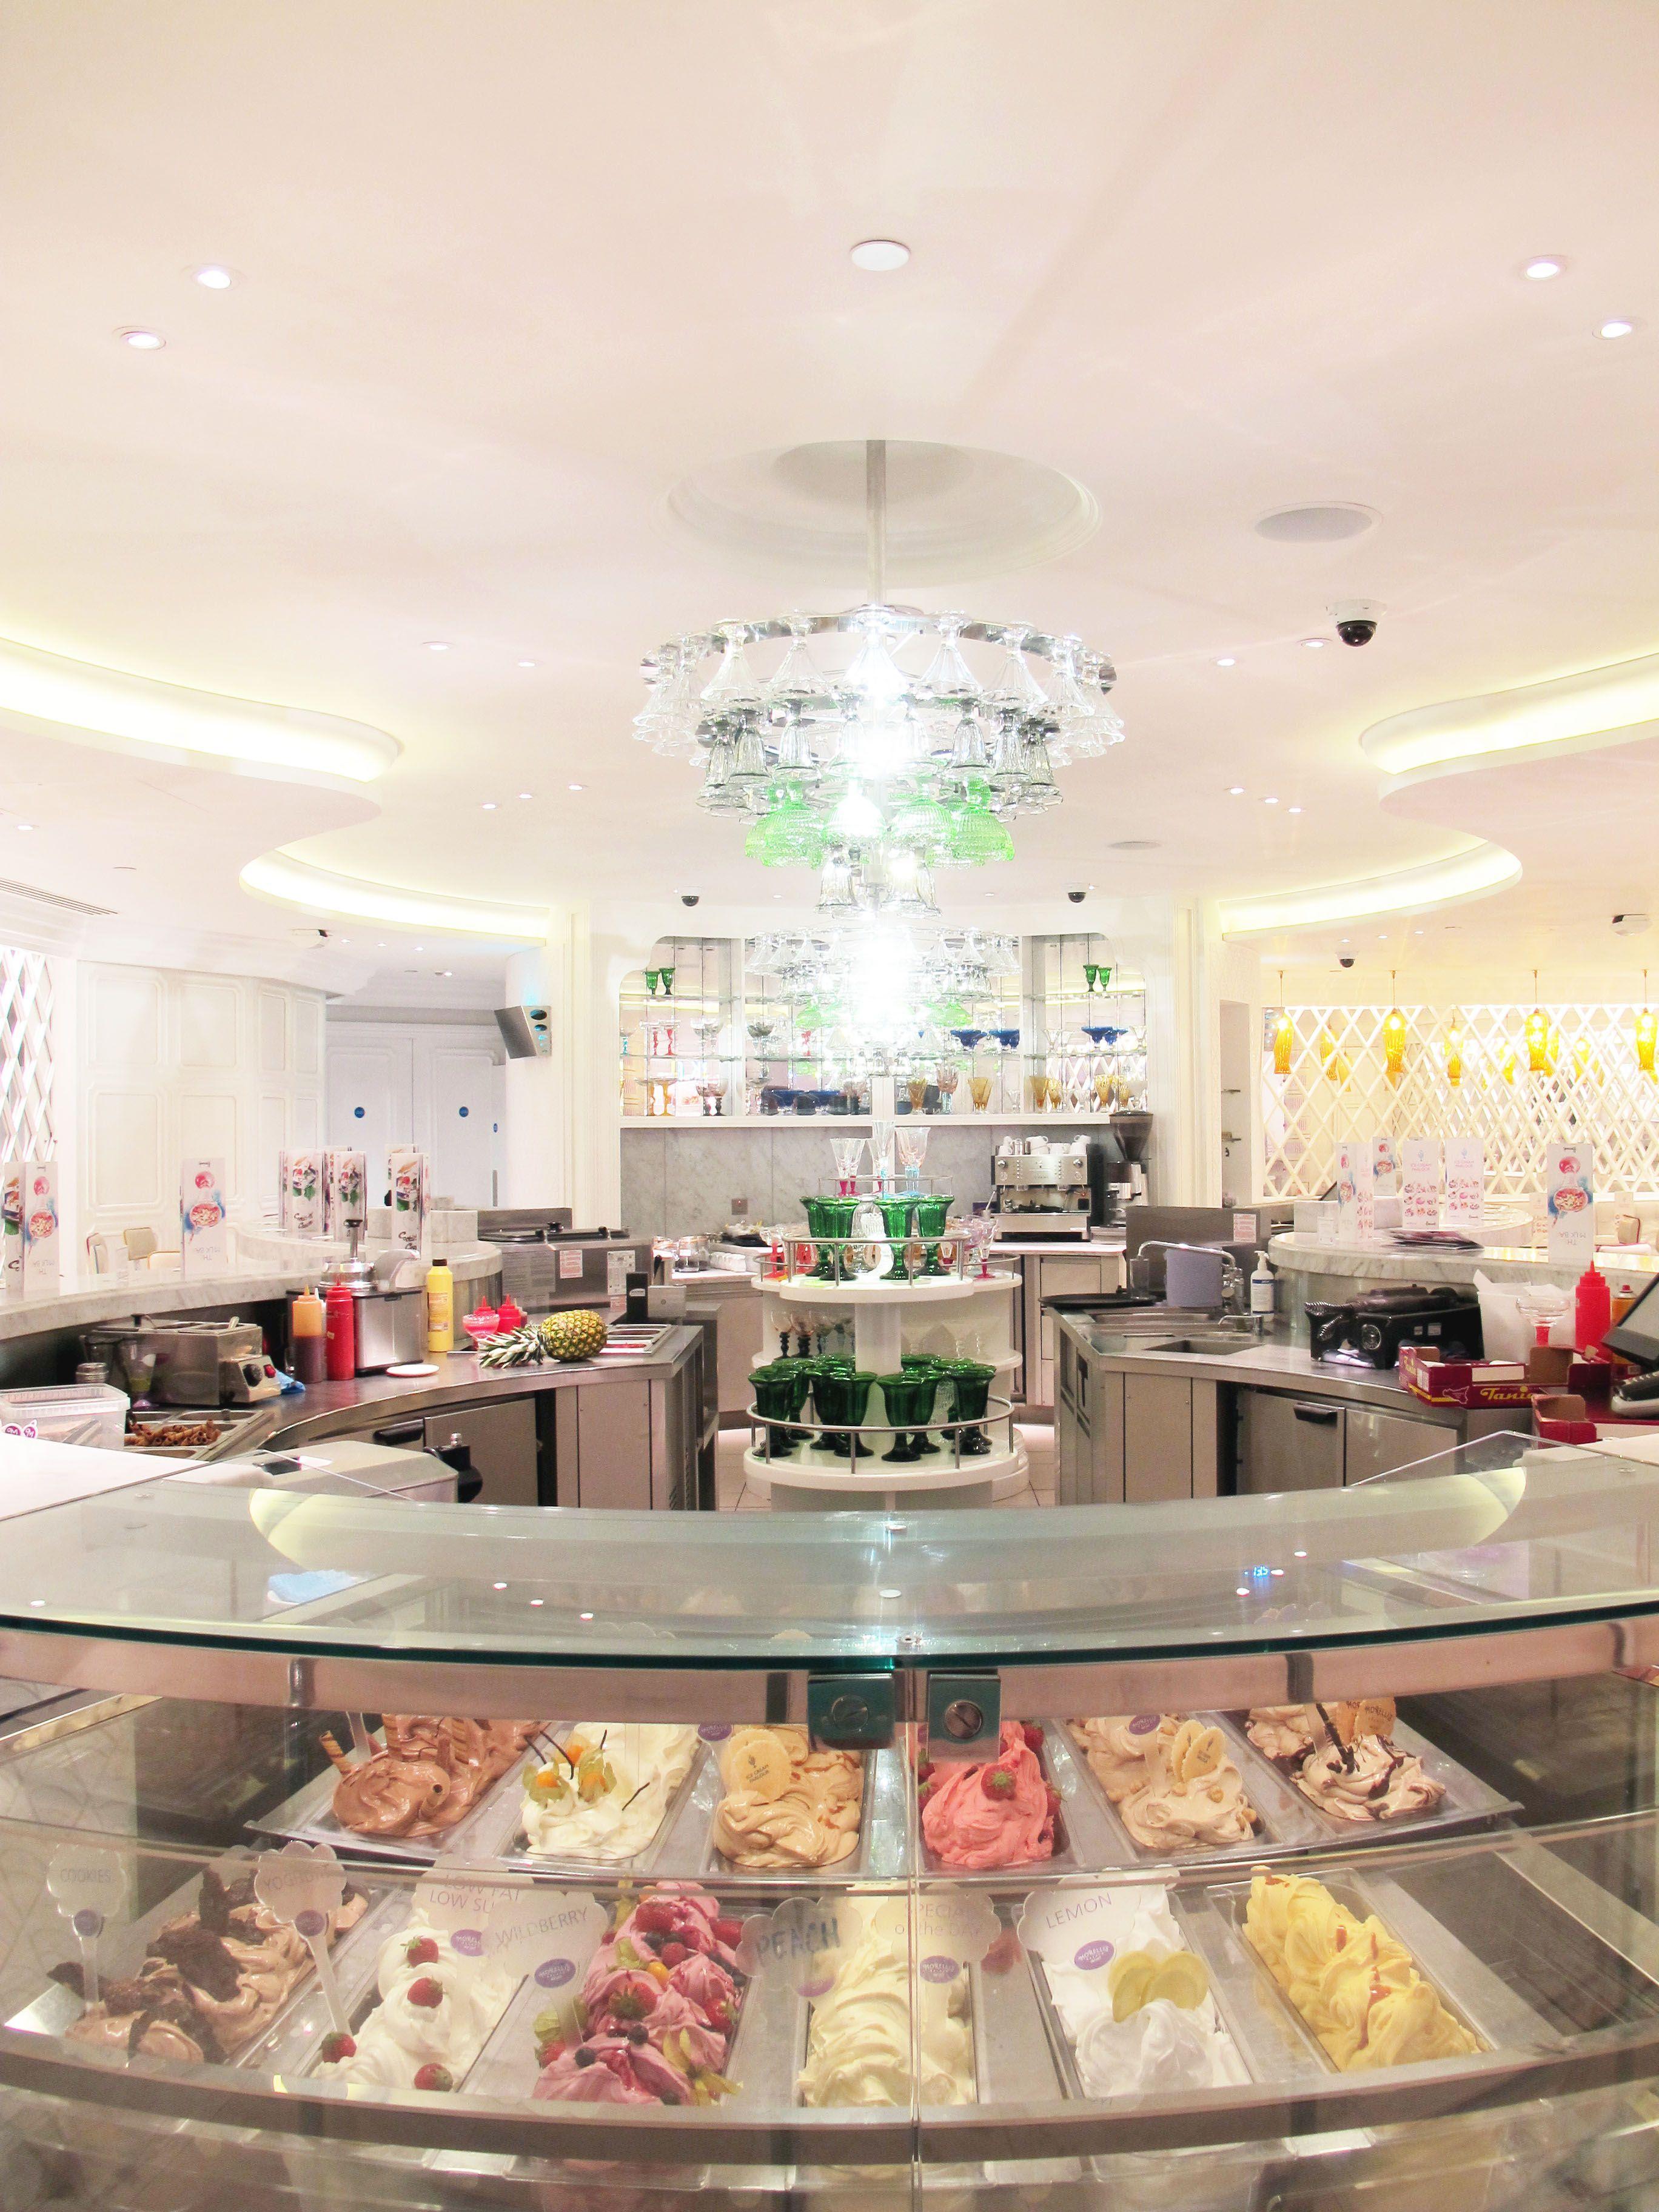 Ice Cream Parlour Serving Lemon Gelato And Other Amazing